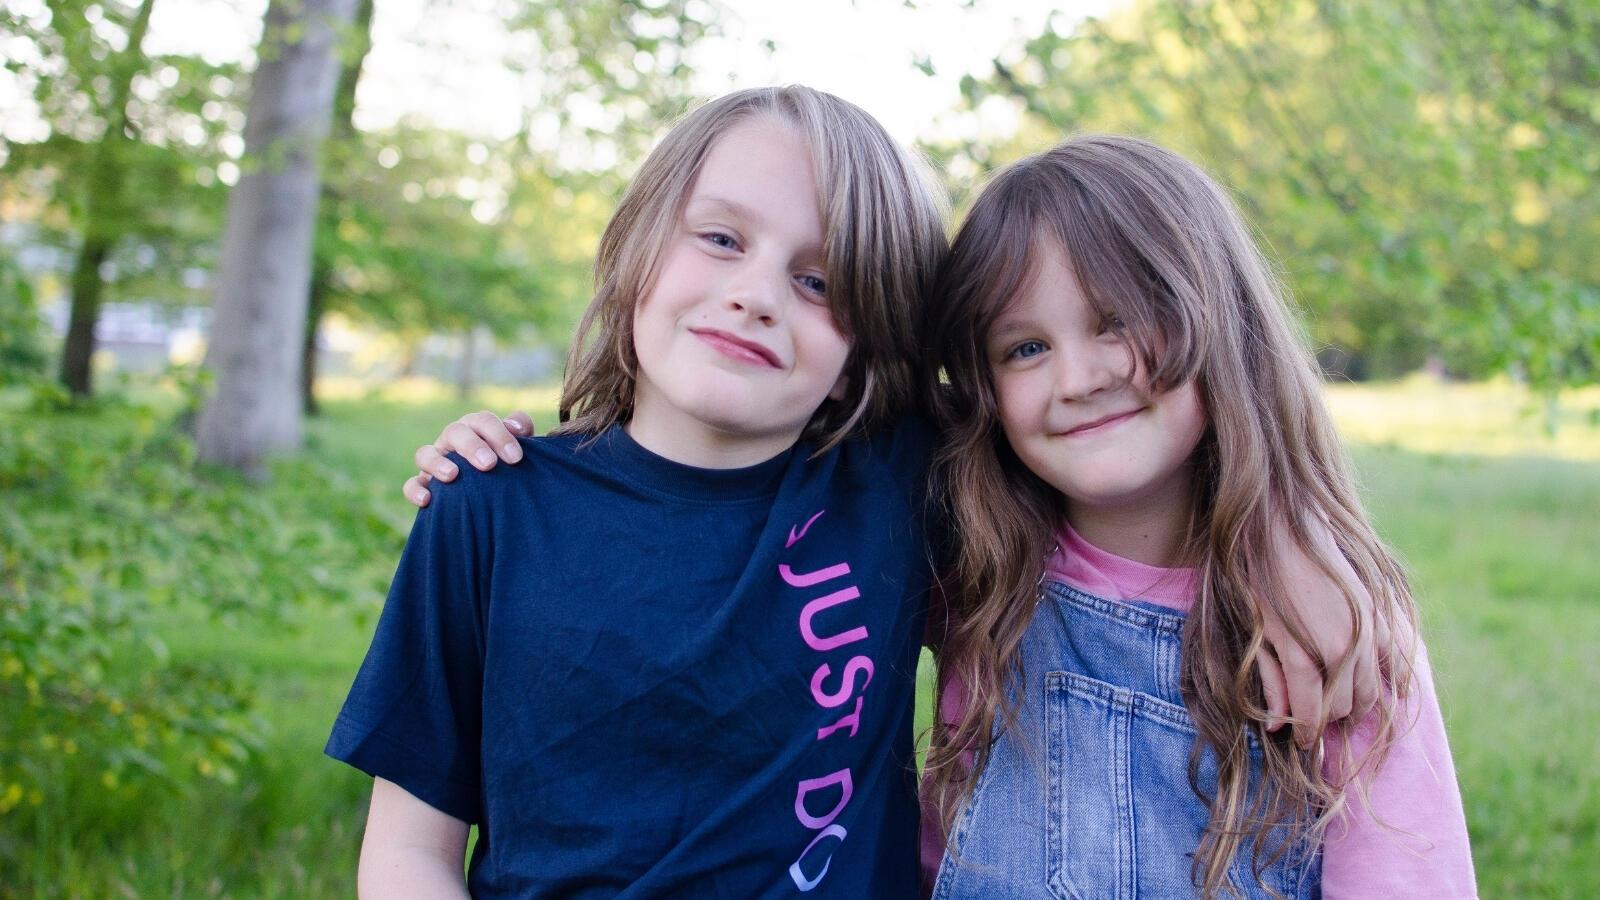 Siblings May 2021